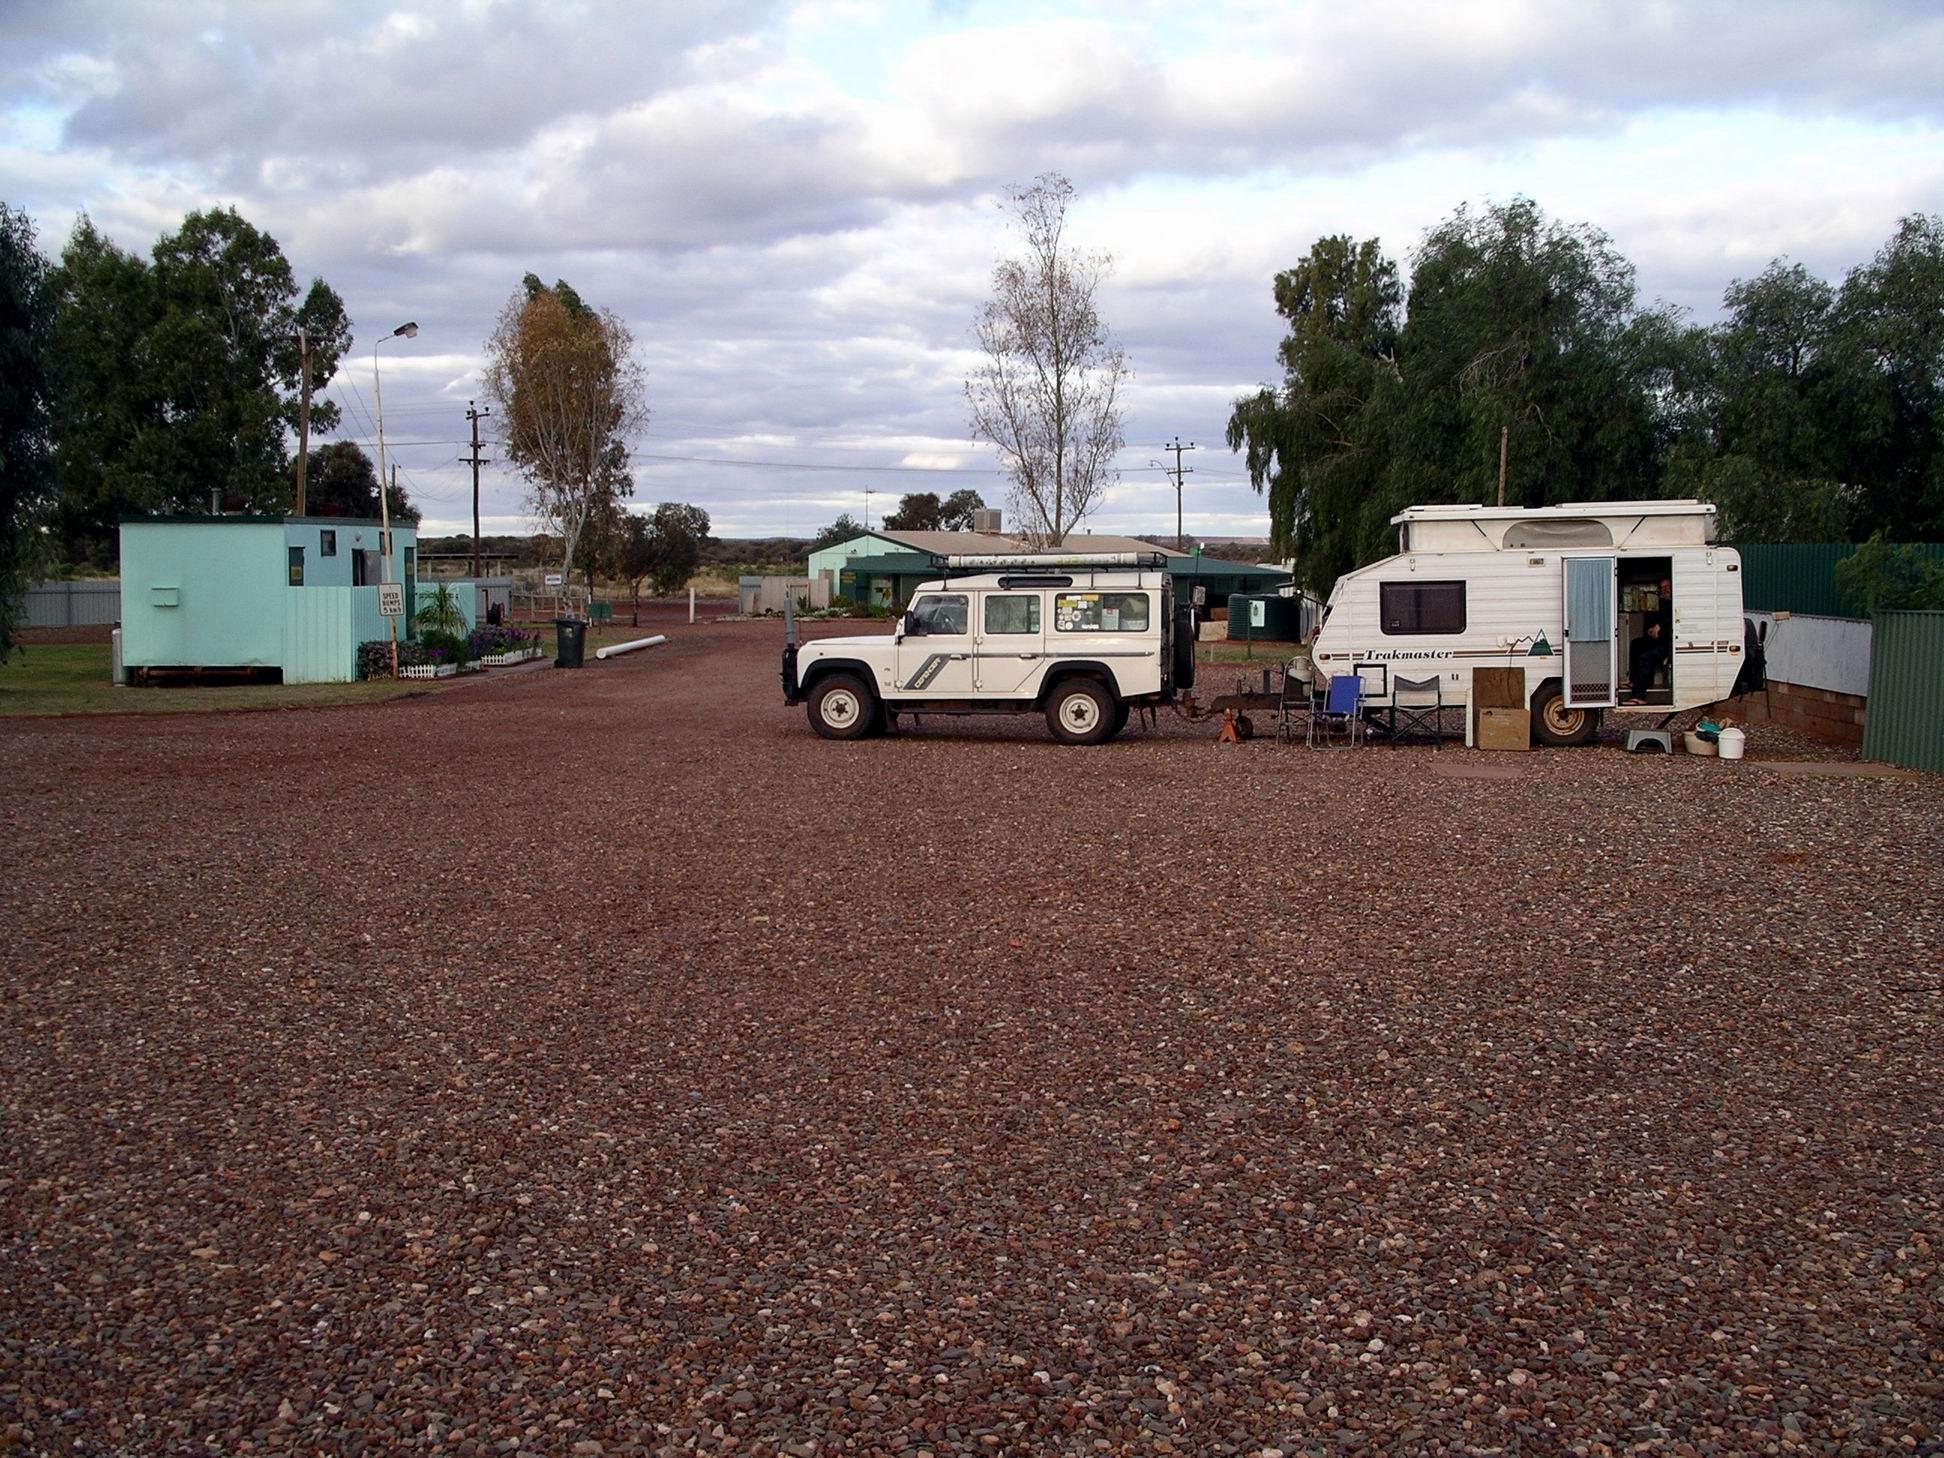 Resize of 08-30-2004 01 Camp Laverton 2.JPG